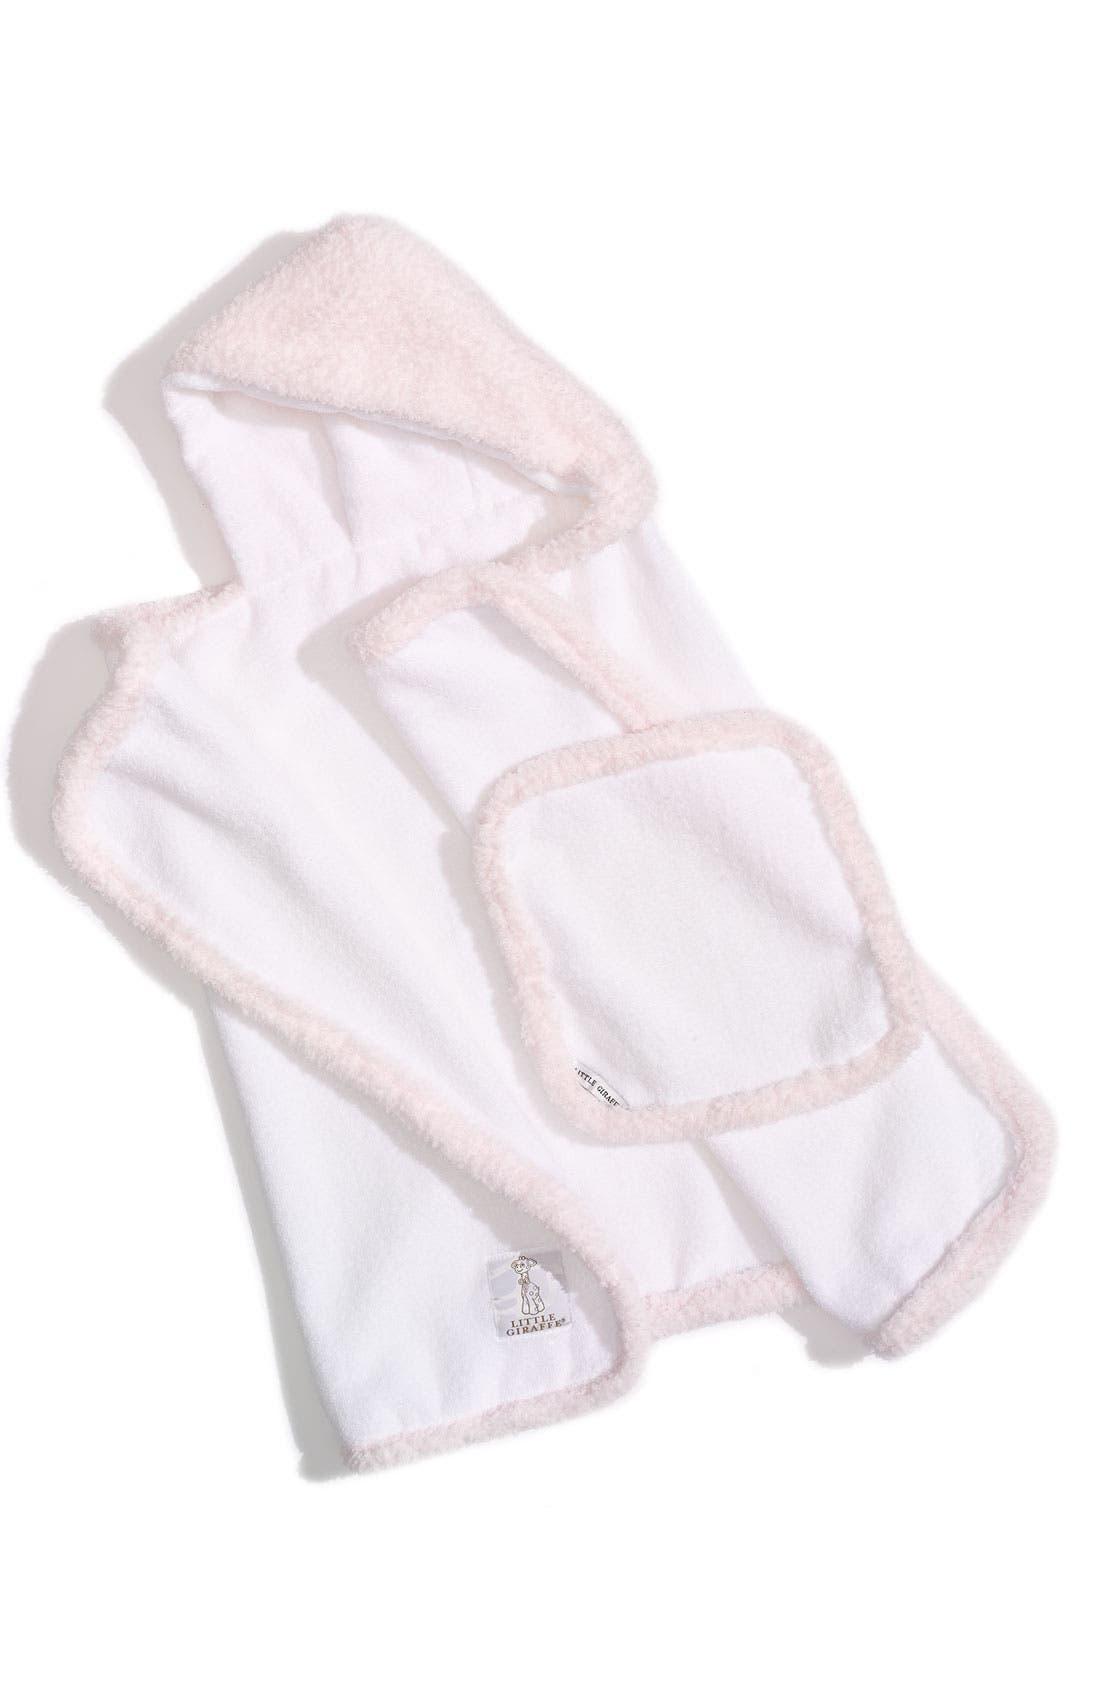 Little Giraffe Towel & Washcloth Set (Infant & Toddler)